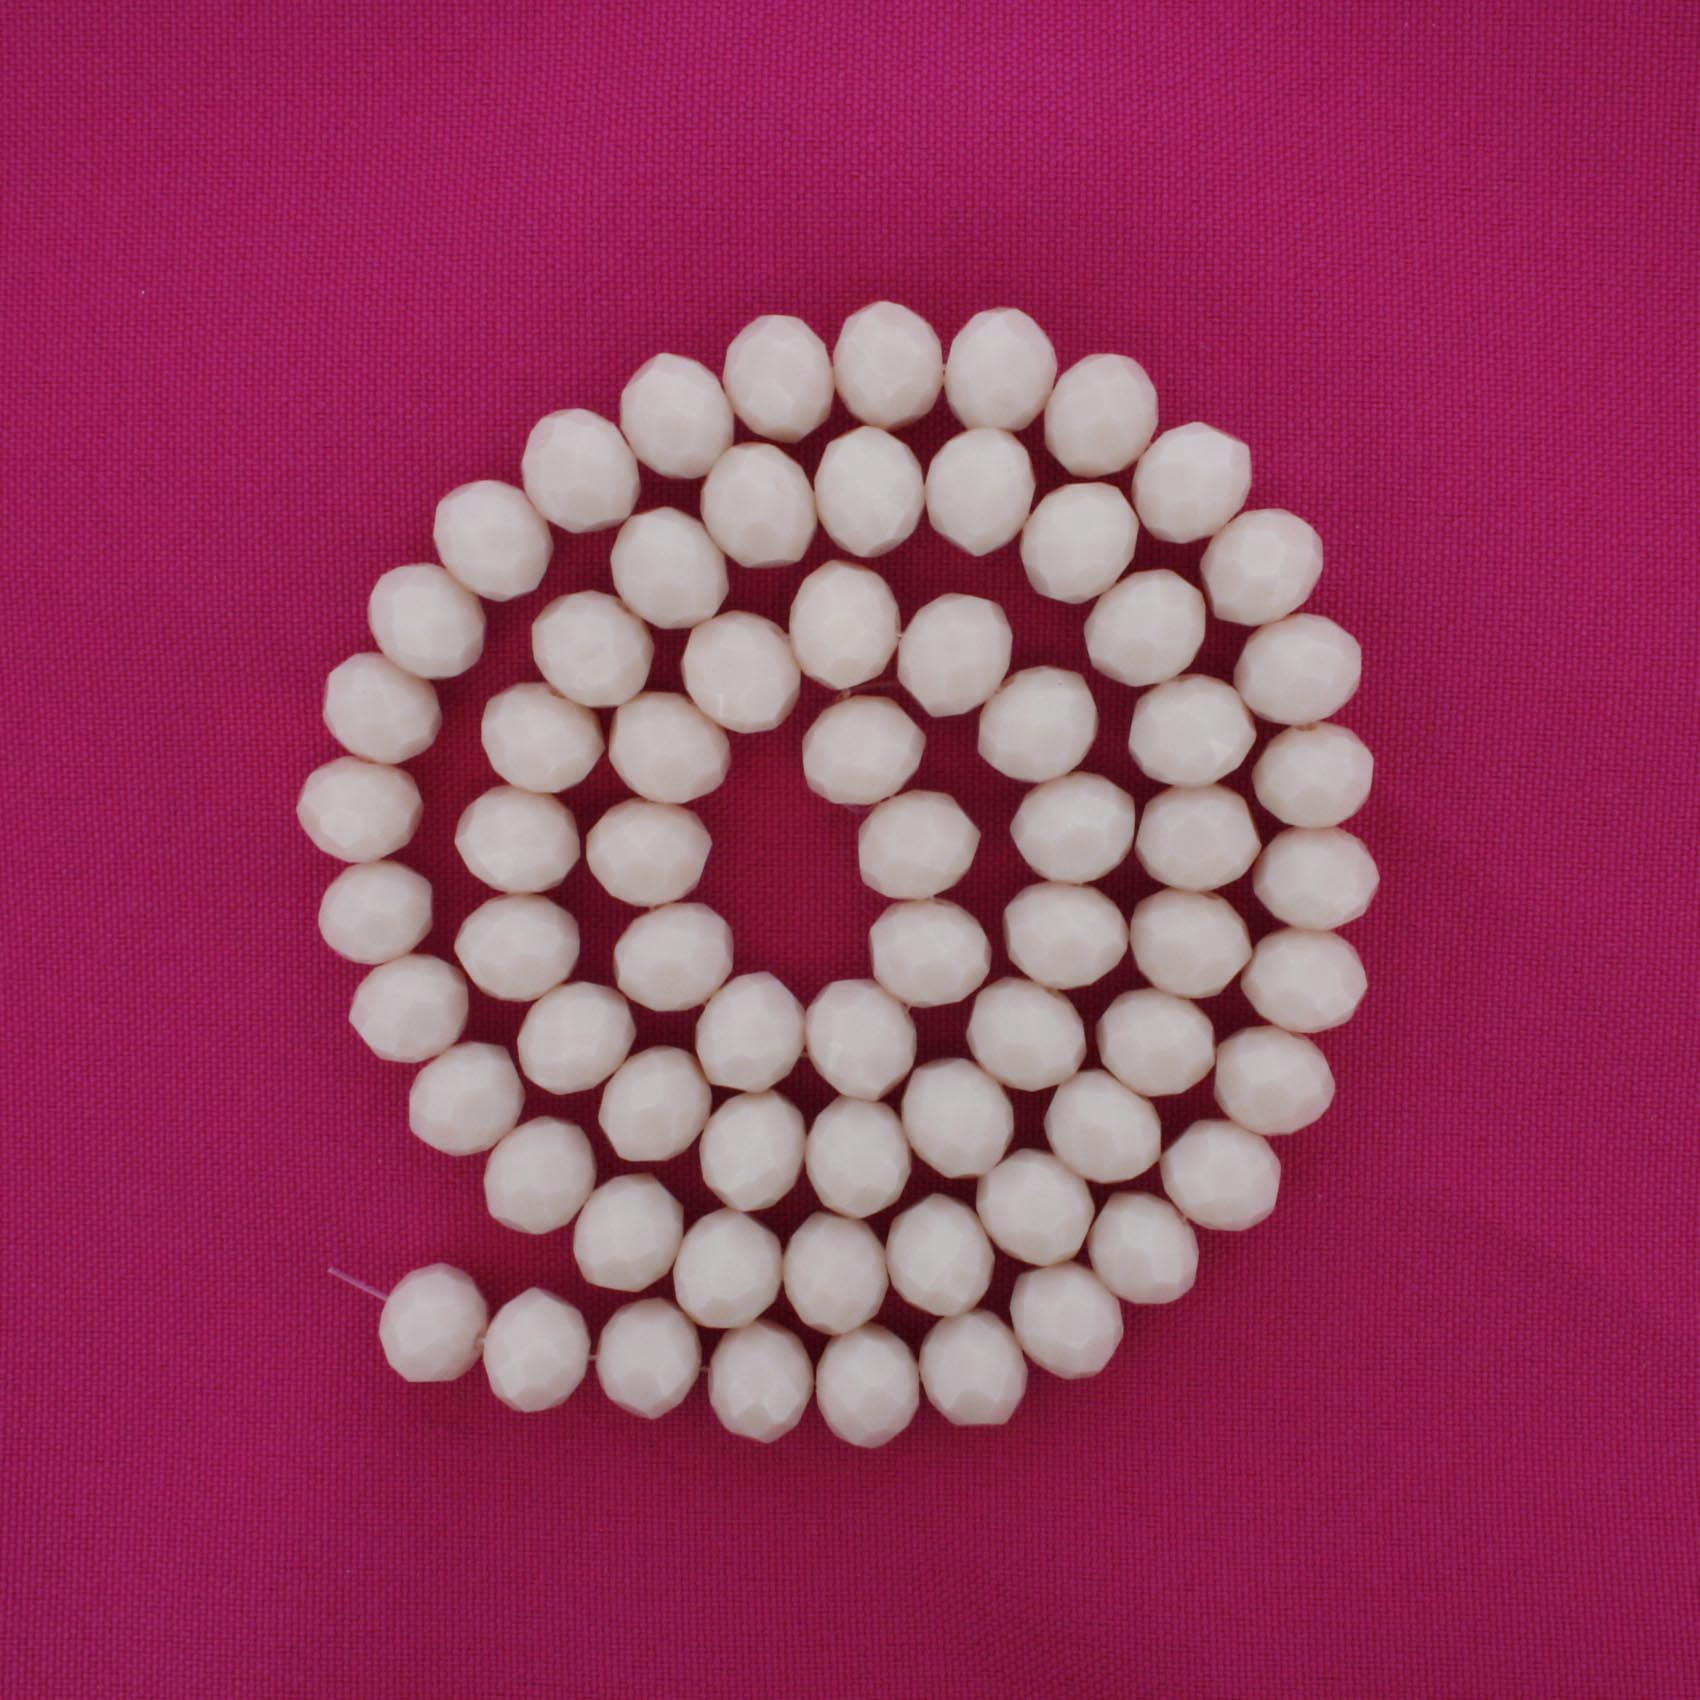 Fio de Cristal - Flat® - Rosa Papel - 10mm  - Stéphanie Bijoux® - Peças para Bijuterias e Artesanato